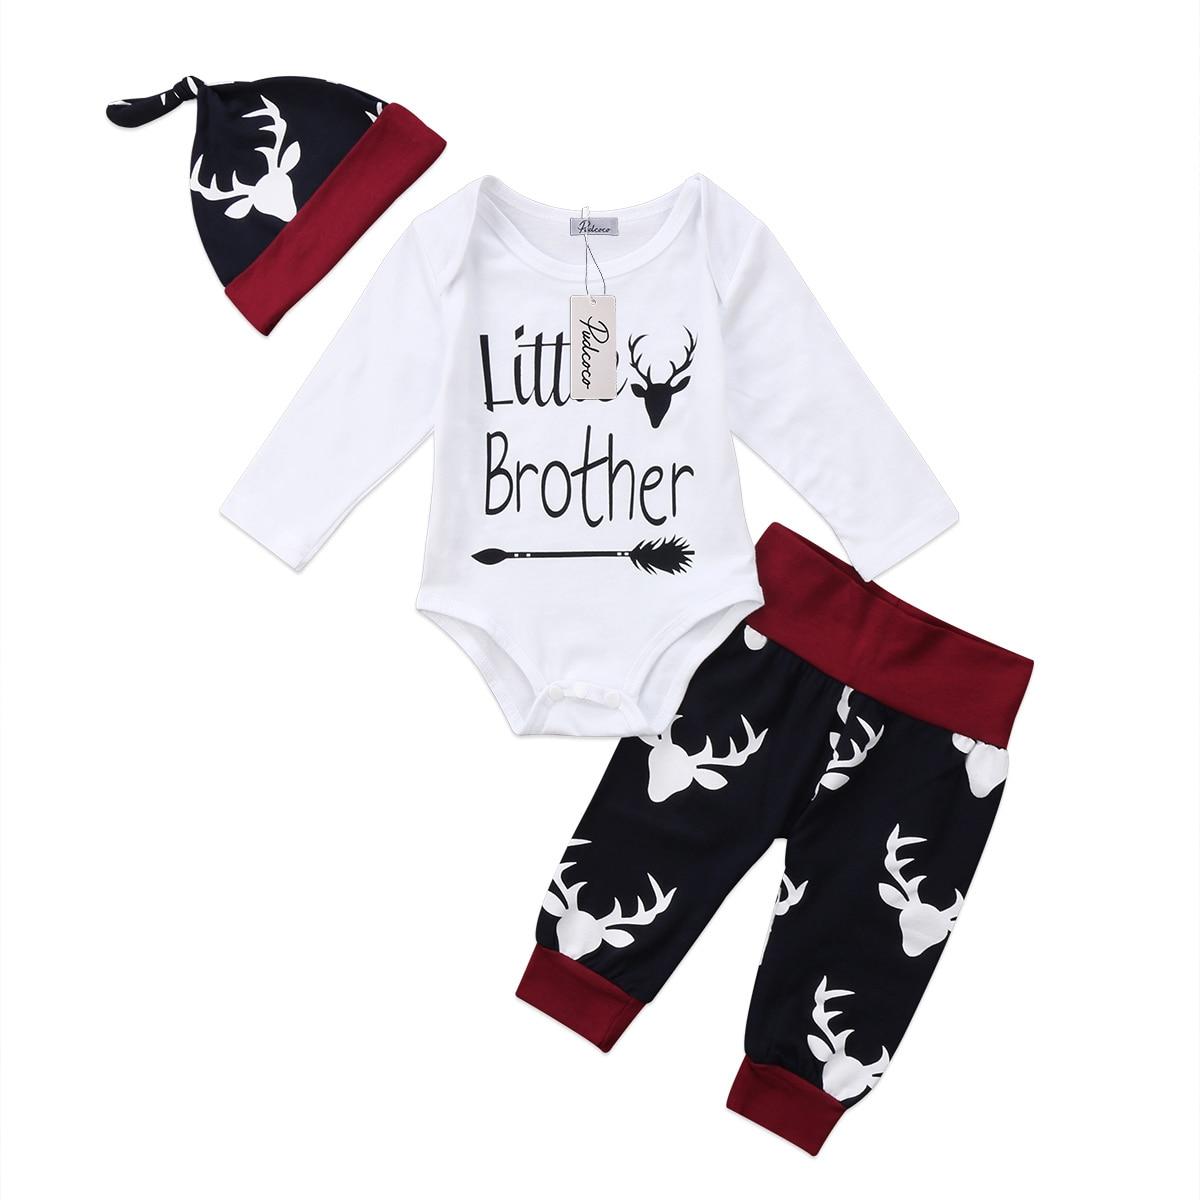 Pudcoco 3Pcs Little Brother Deer Outfits Newborn Infant Baby Boy Clothing Sets Cotton Romper Pants Hat Clothes 0-18M US